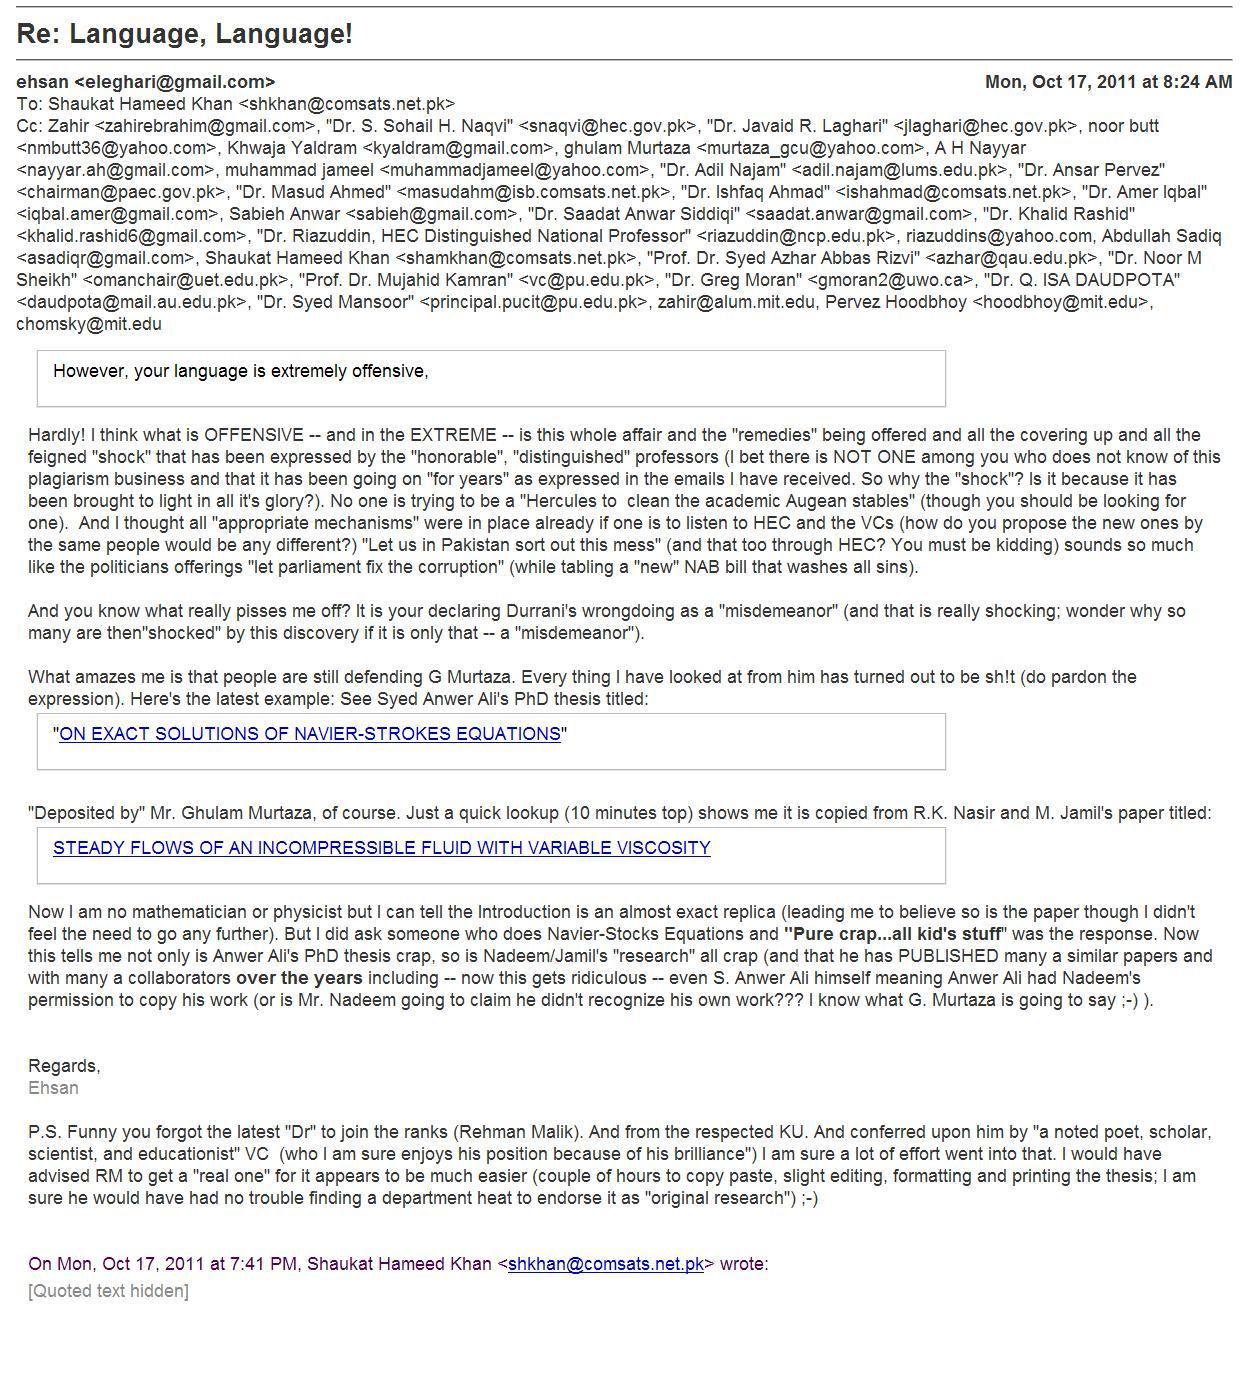 Activist Ehsan Leghari of Lahore Pakistan responds to Dr. Shaukat Hameed Khan